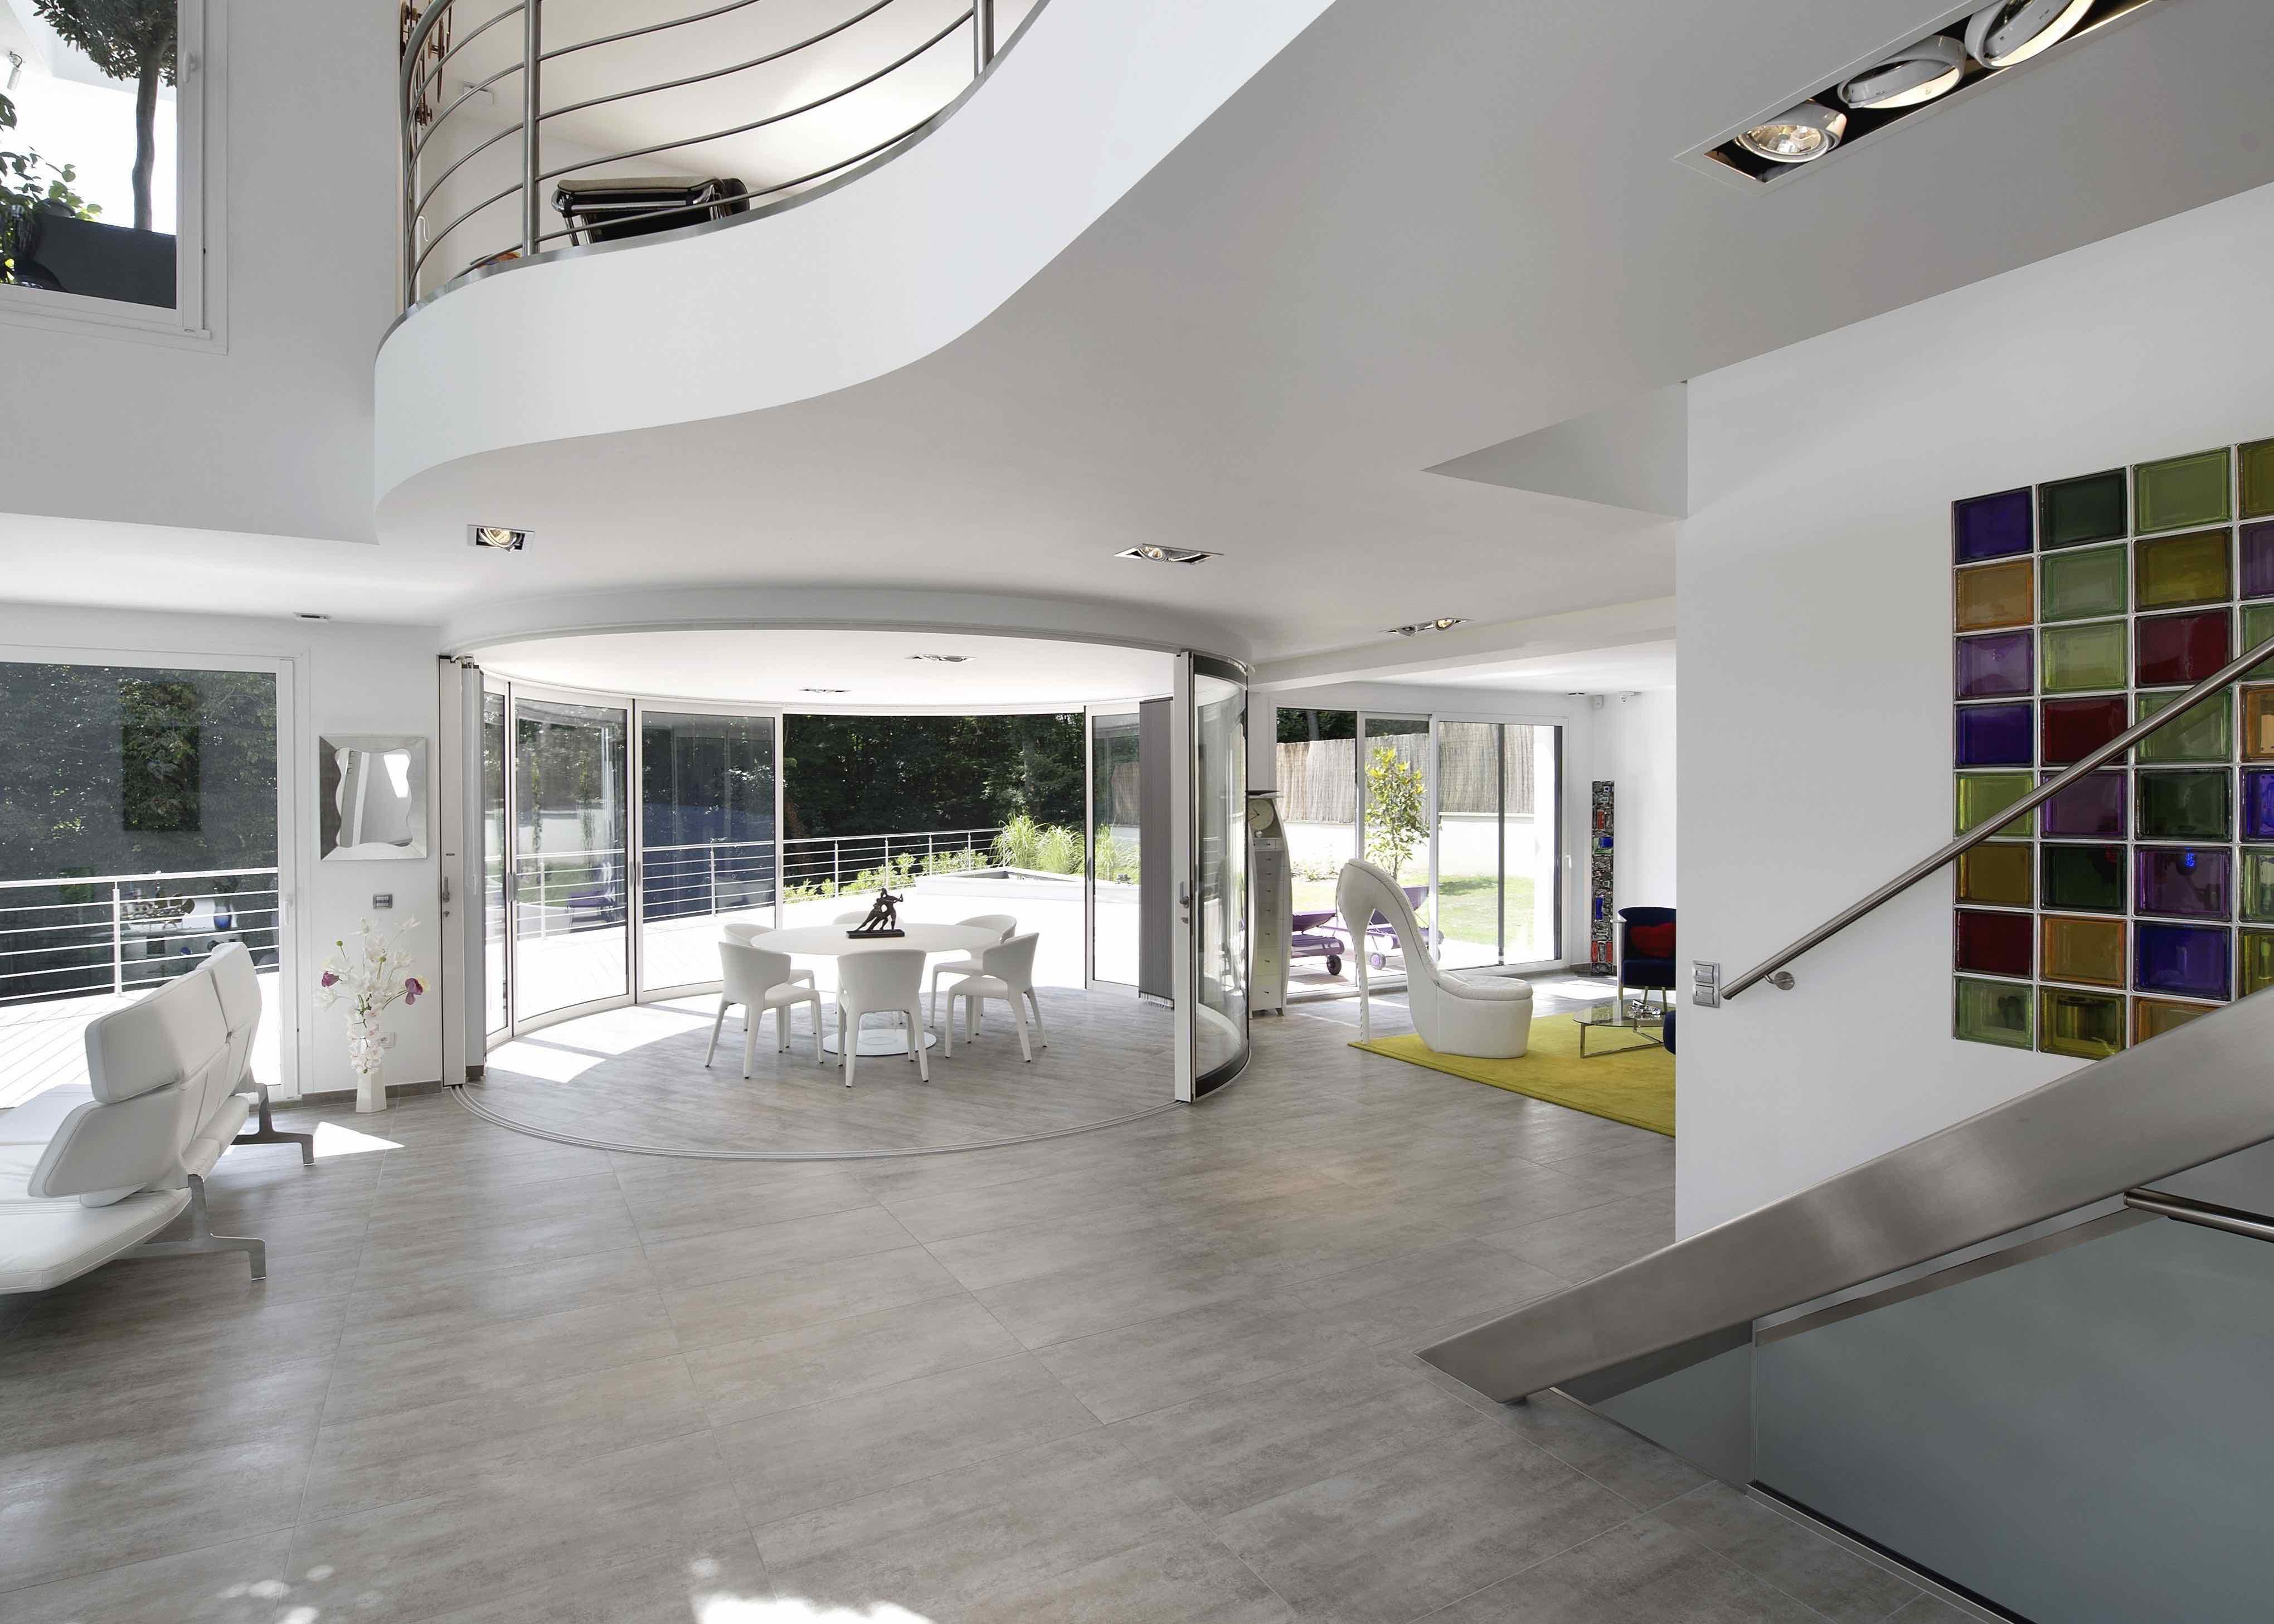 architect p giorgi 39 s house lumicene. Black Bedroom Furniture Sets. Home Design Ideas